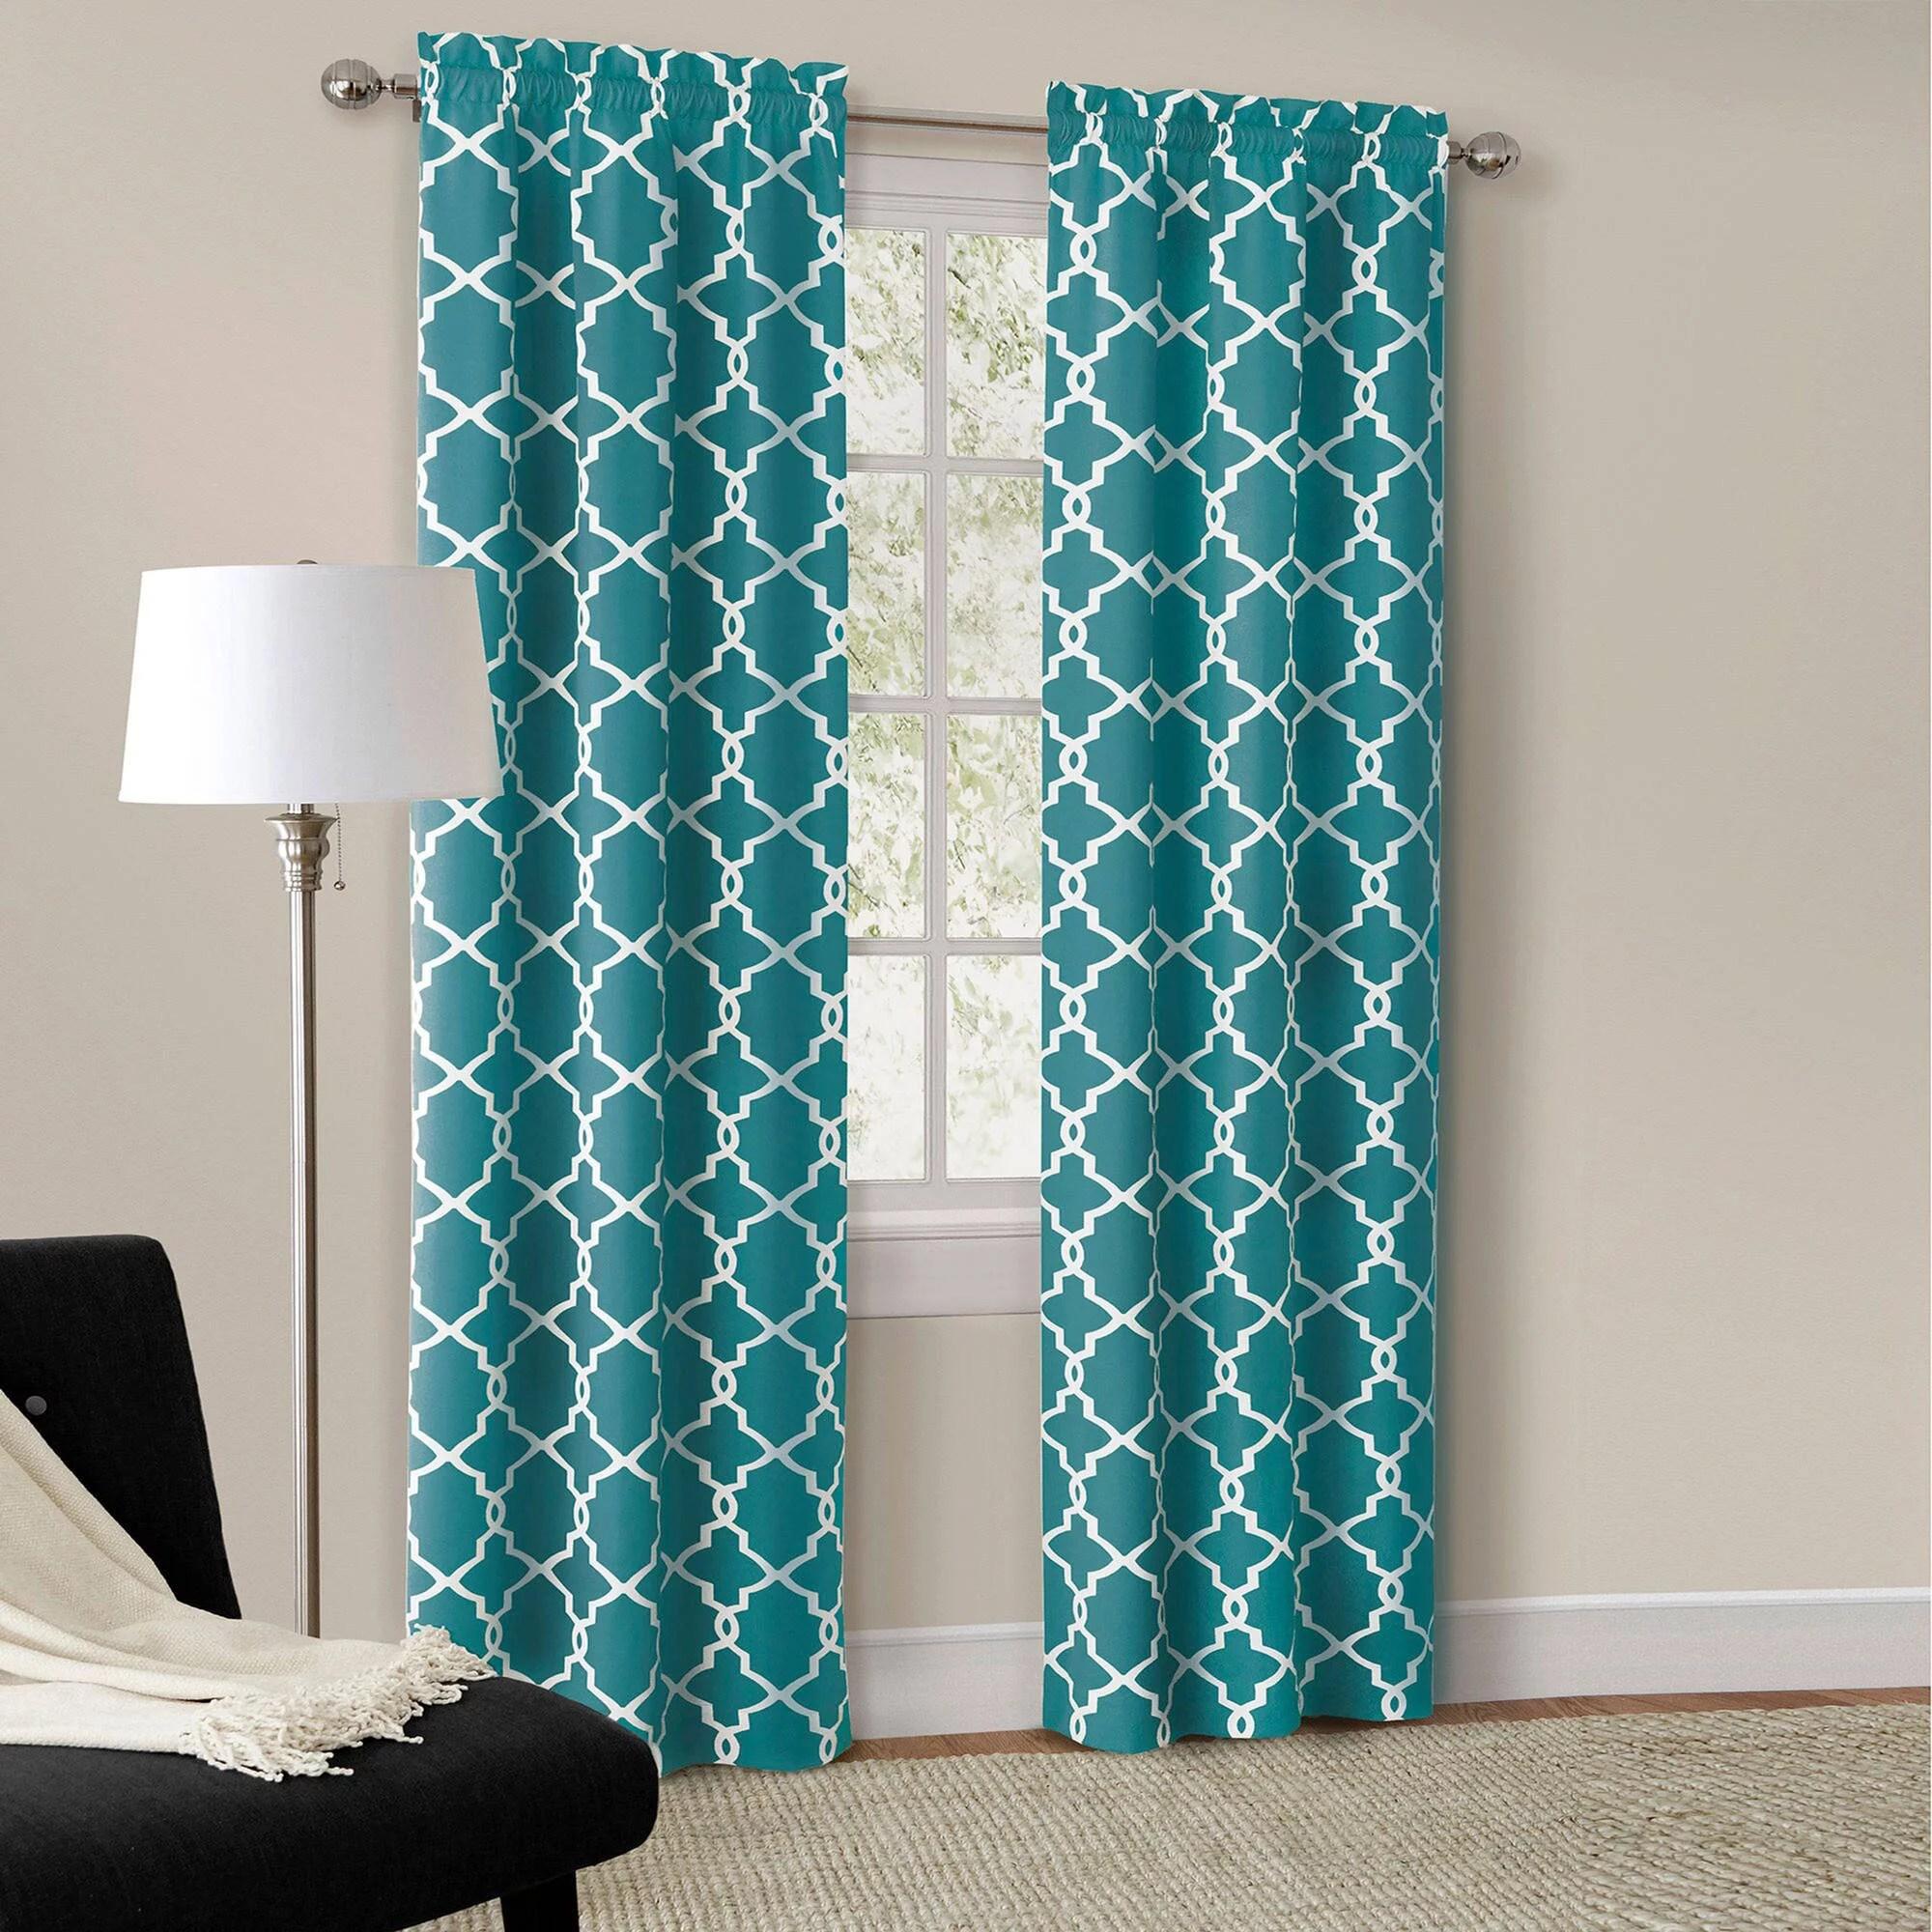 mainstays calix fashion light filtering rod pocket window curtain panel set of 2 teal 56 x 63 walmart com